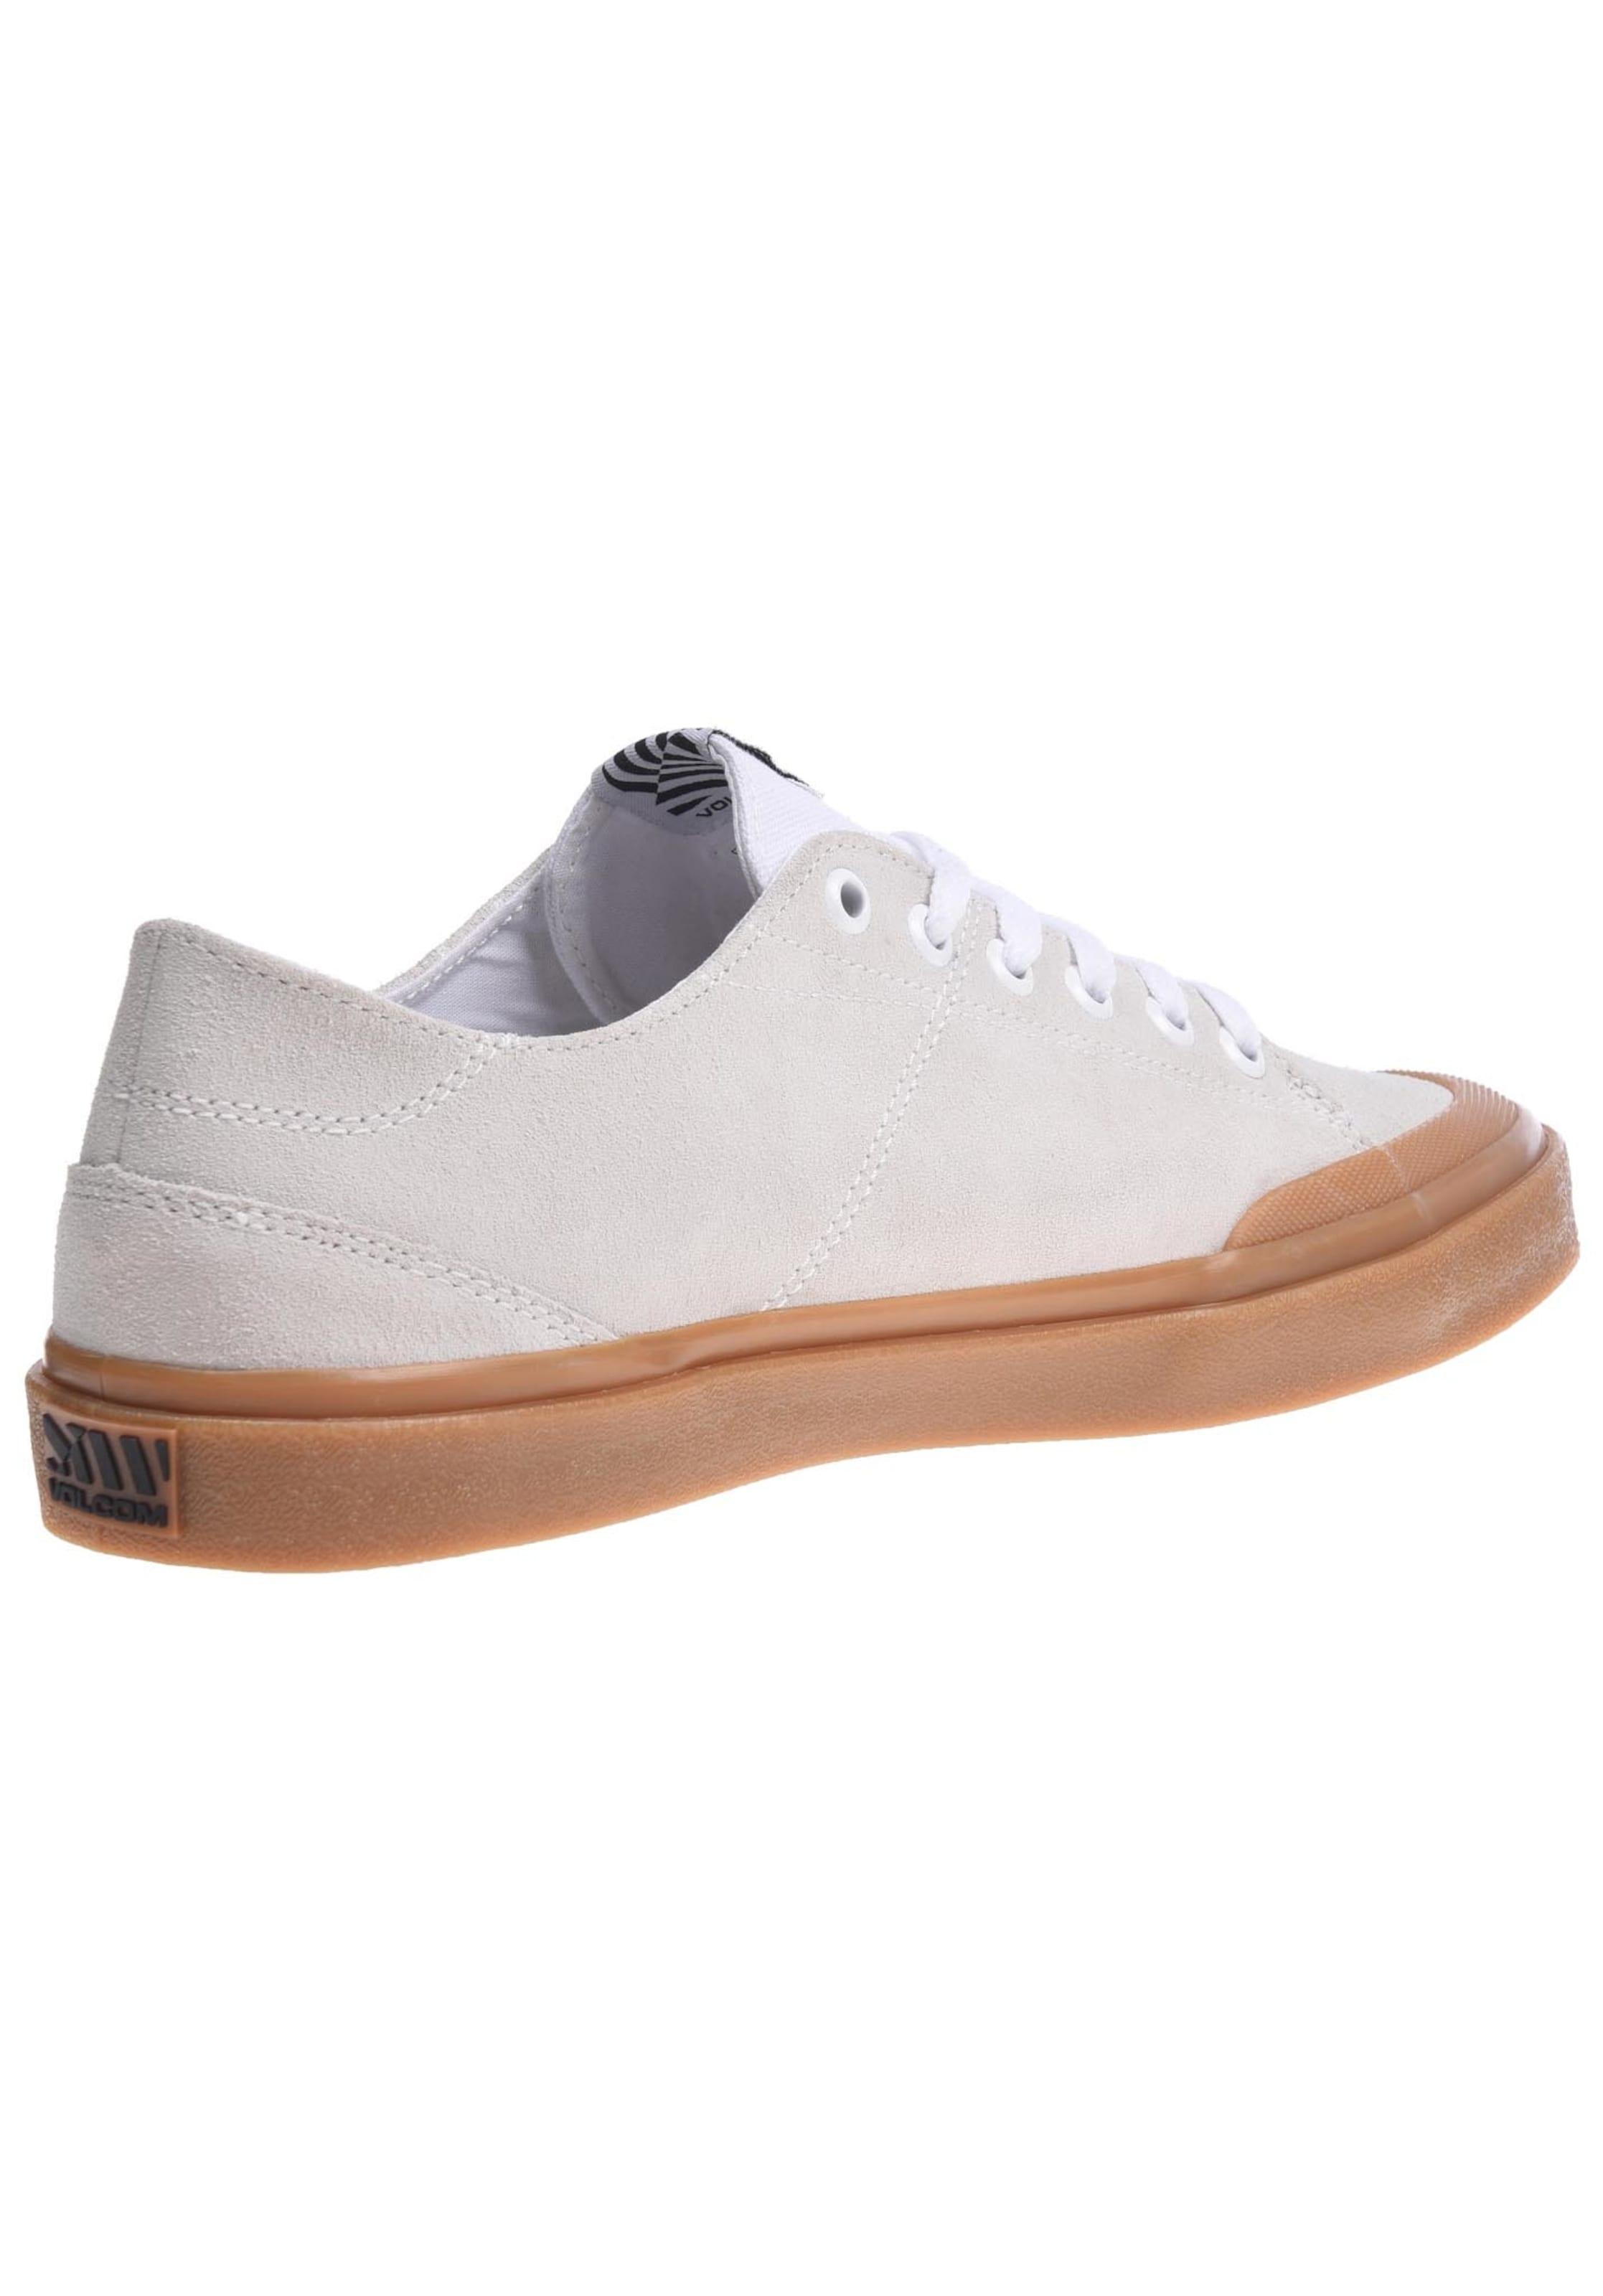 In Sneaker Creme Suede' Volcom 'leeds IEWHeD9Y2b